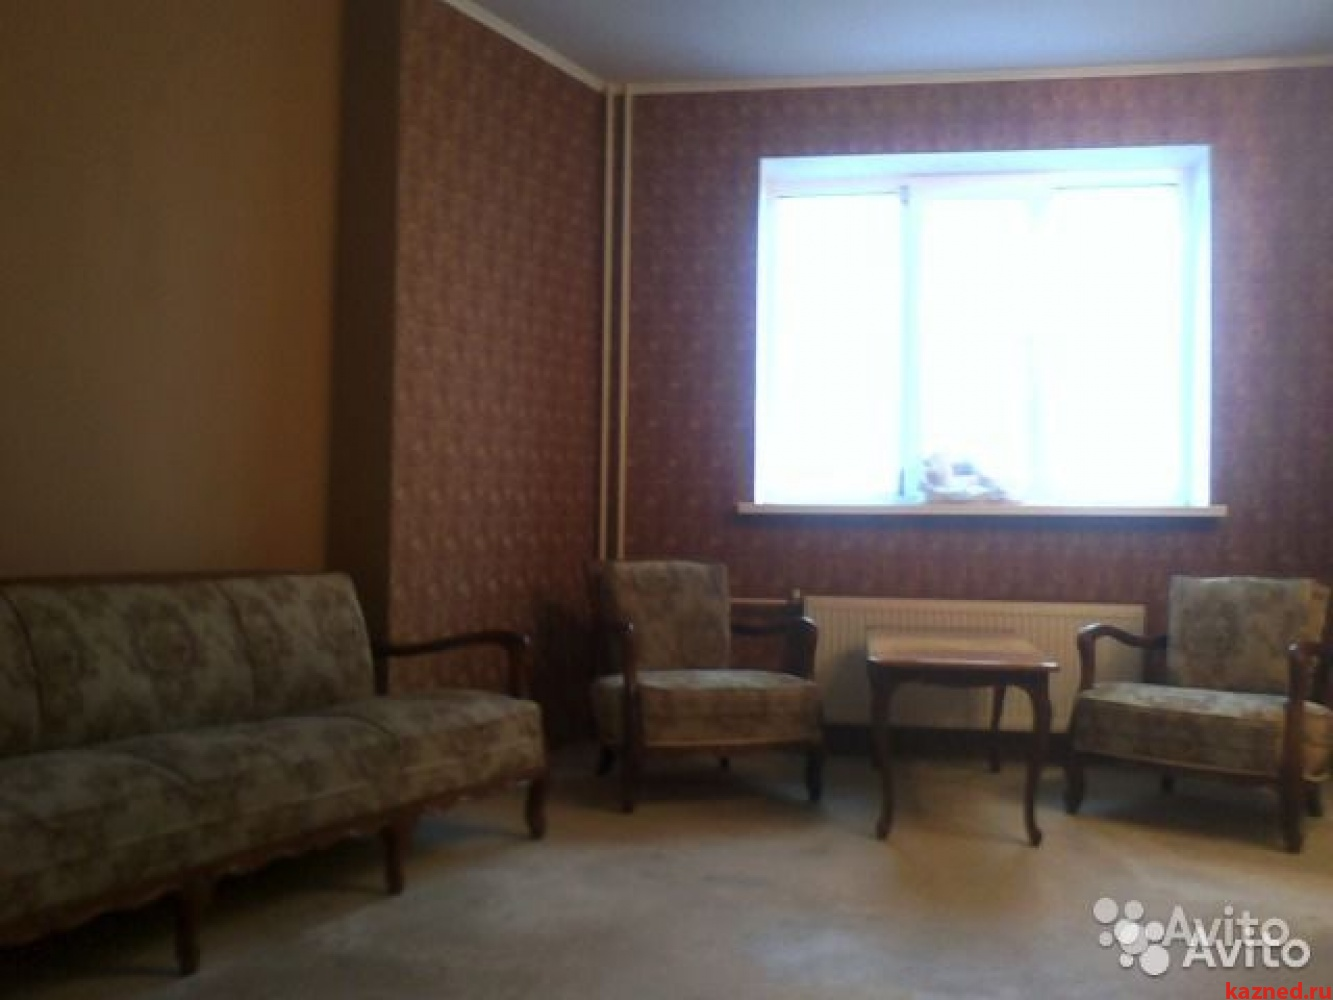 Продажа 2-к квартиры Юлиуса Фучика, 2Б, 66 м2  (миниатюра №4)